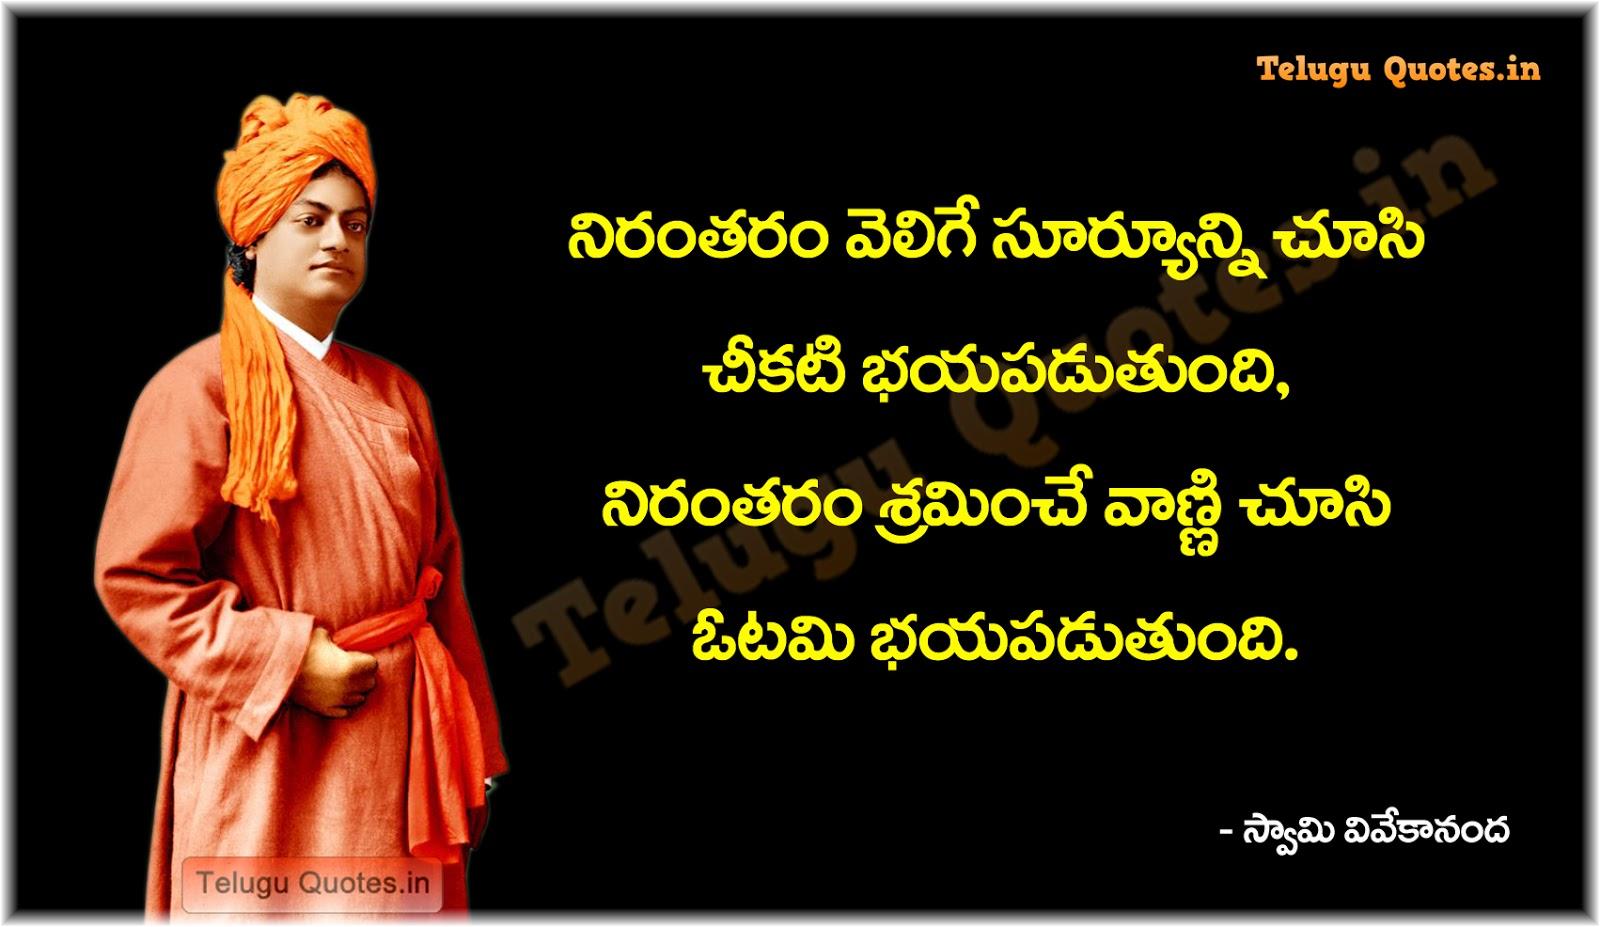 the life of swami vivekananda Swami vivekananda (bengali: [ʃami bibekanɔnd̪o] ( listen) 12 january 1863 – 4 july 1902), born narendranath datta (bengali: [nɔrend̪ronat̪ʰ d̪ɔt̪o]), was an indian hindu monk, a chief disciple of the 19th-century indian mystic ramakrishna.